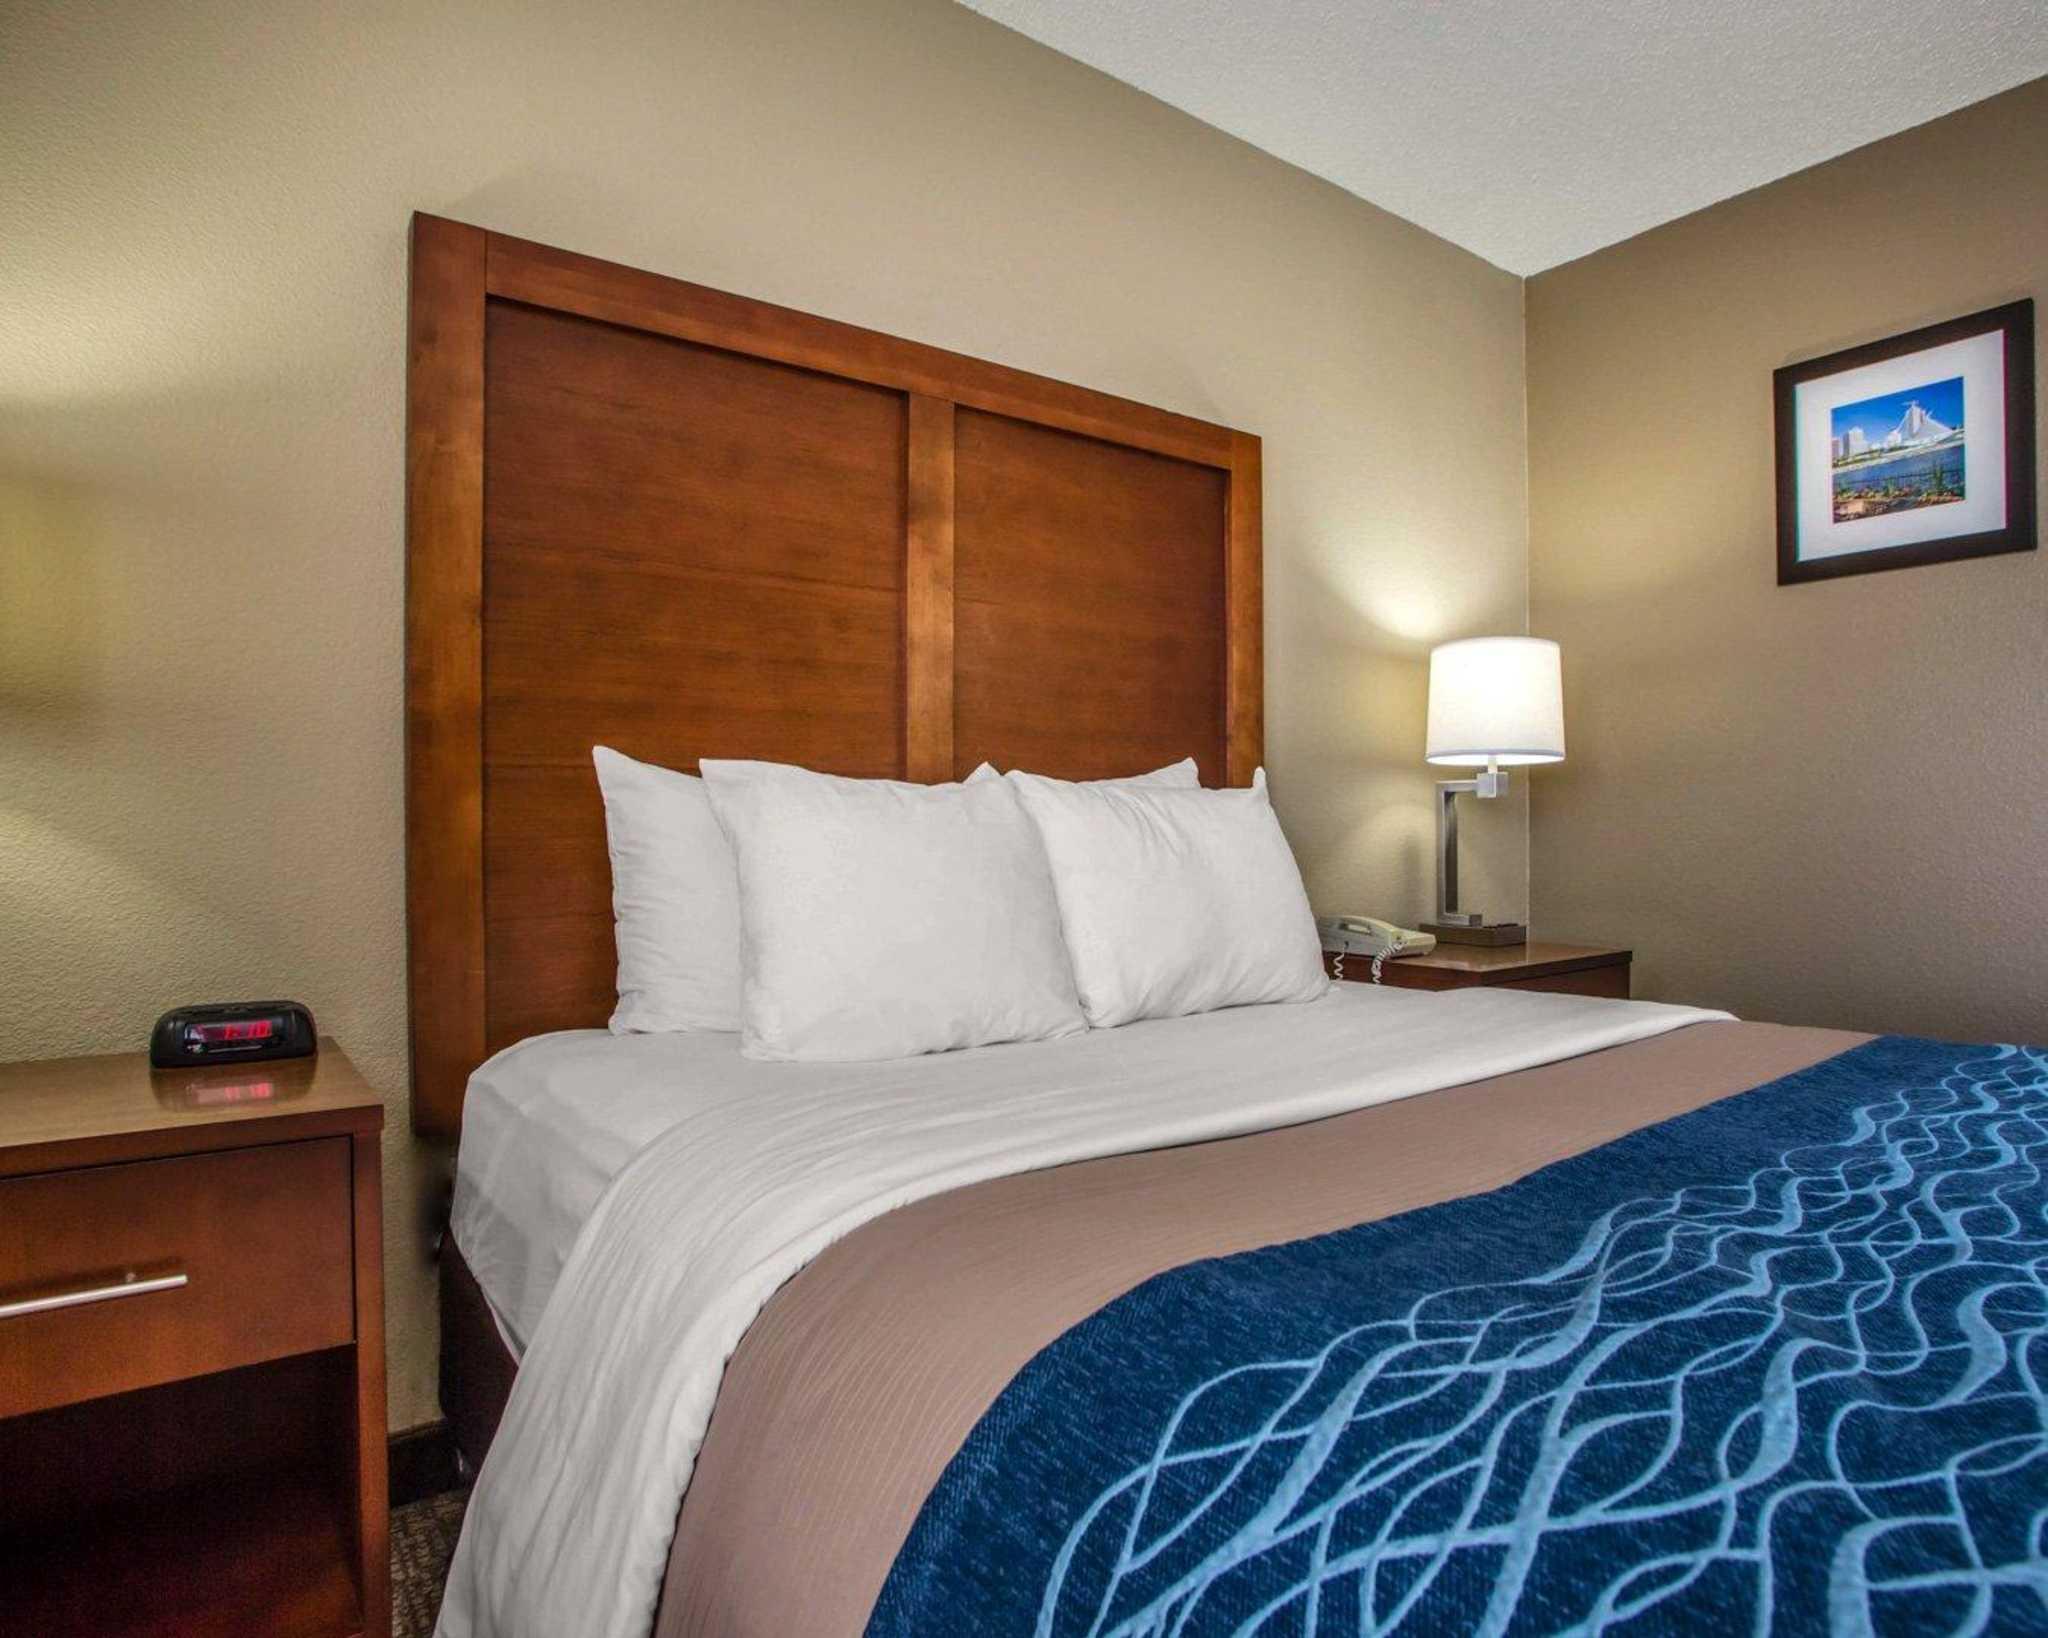 Comfort Inn & Suites Jackson - West Bend image 26